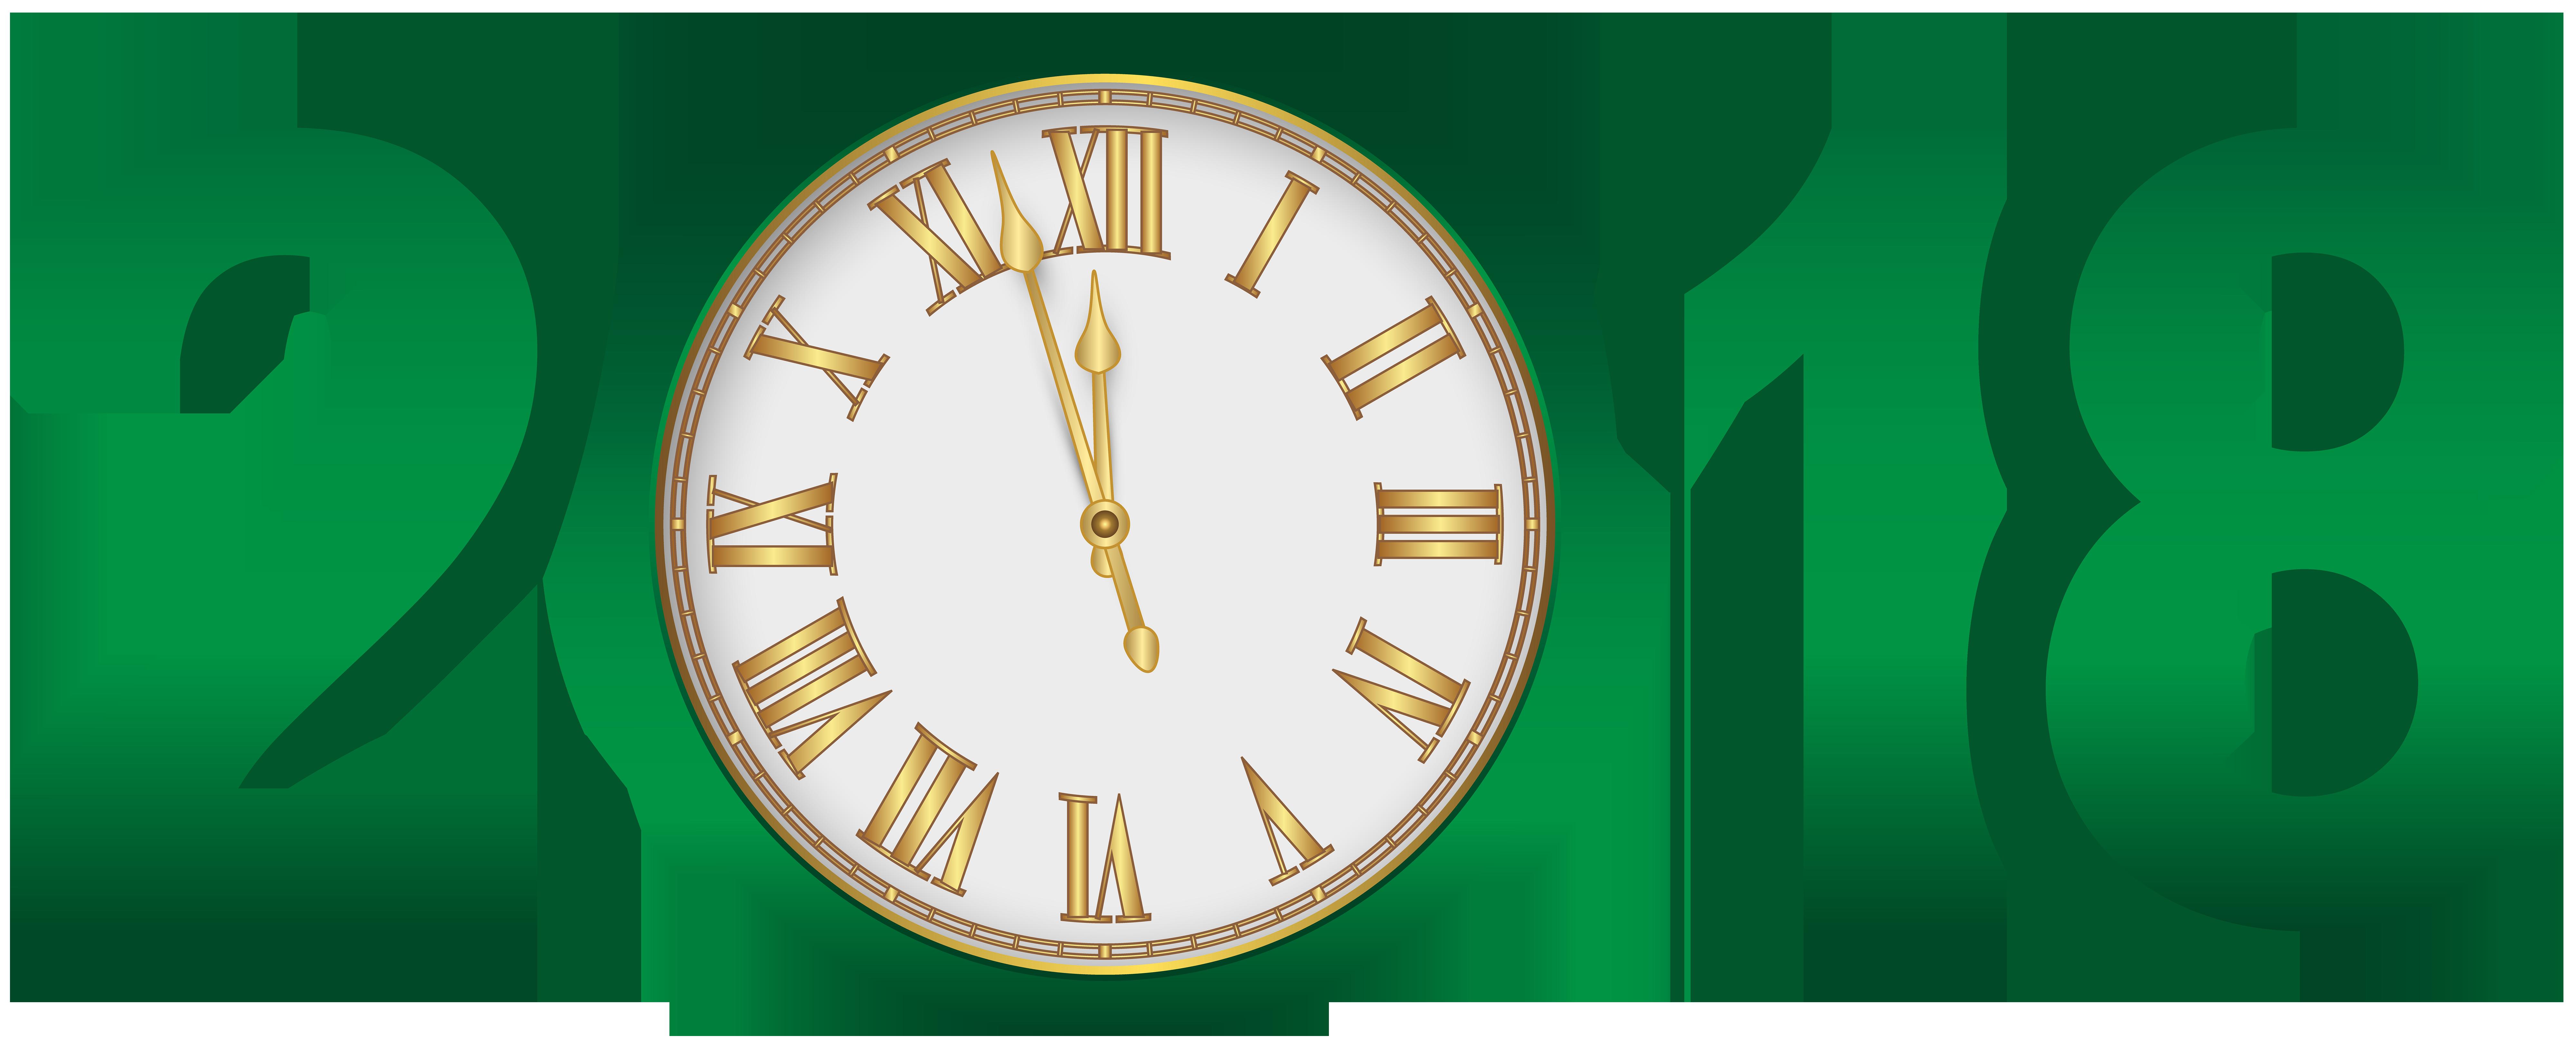 8000x3247 Clock Clipart Transparent. View Full Size Clock Clipart